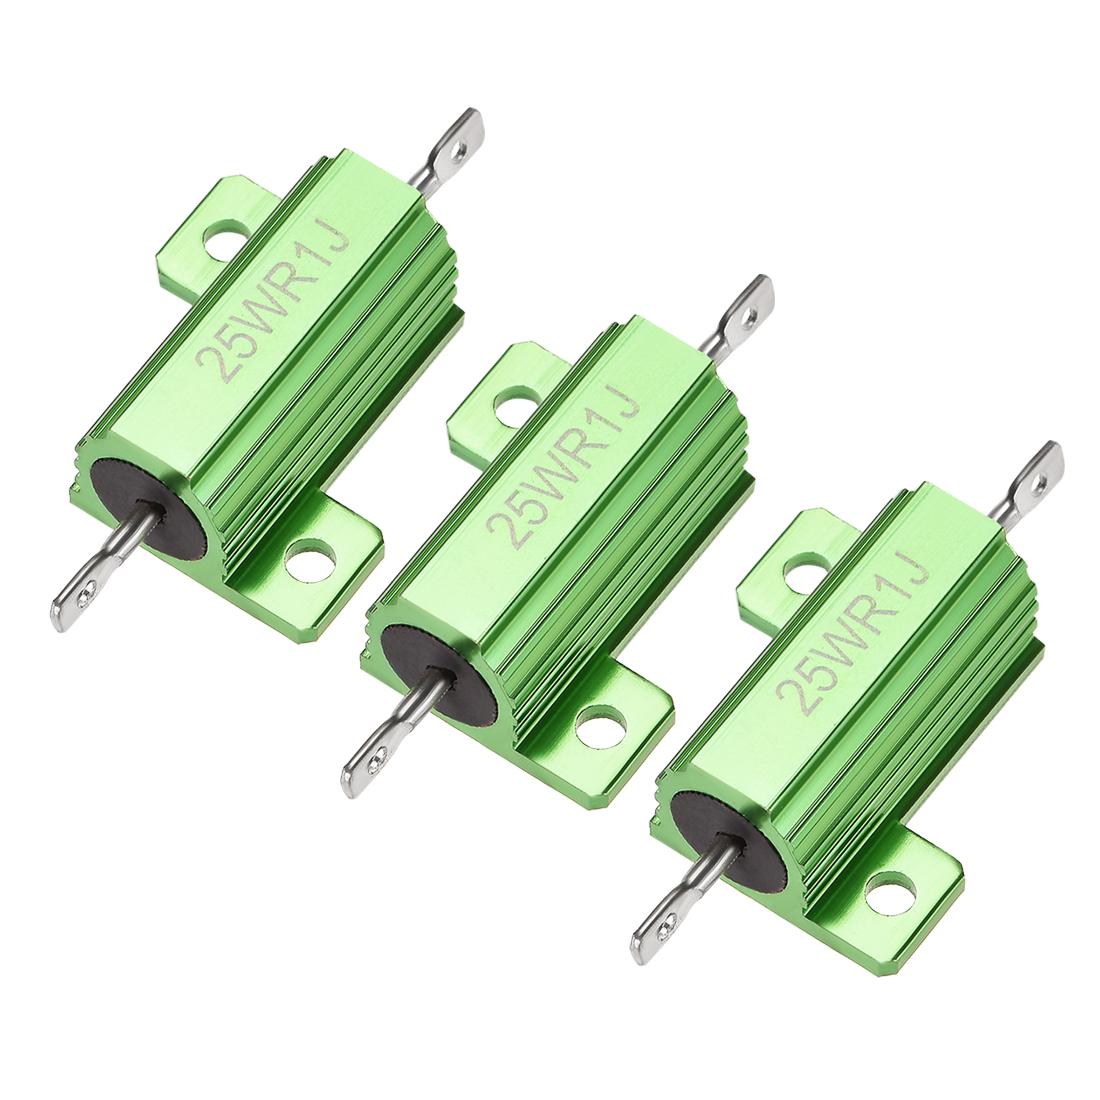 25W 0.1 Ohm 5% Aluminum Housing Resistor Wirewound Resistor Green Tone 3 Pcs